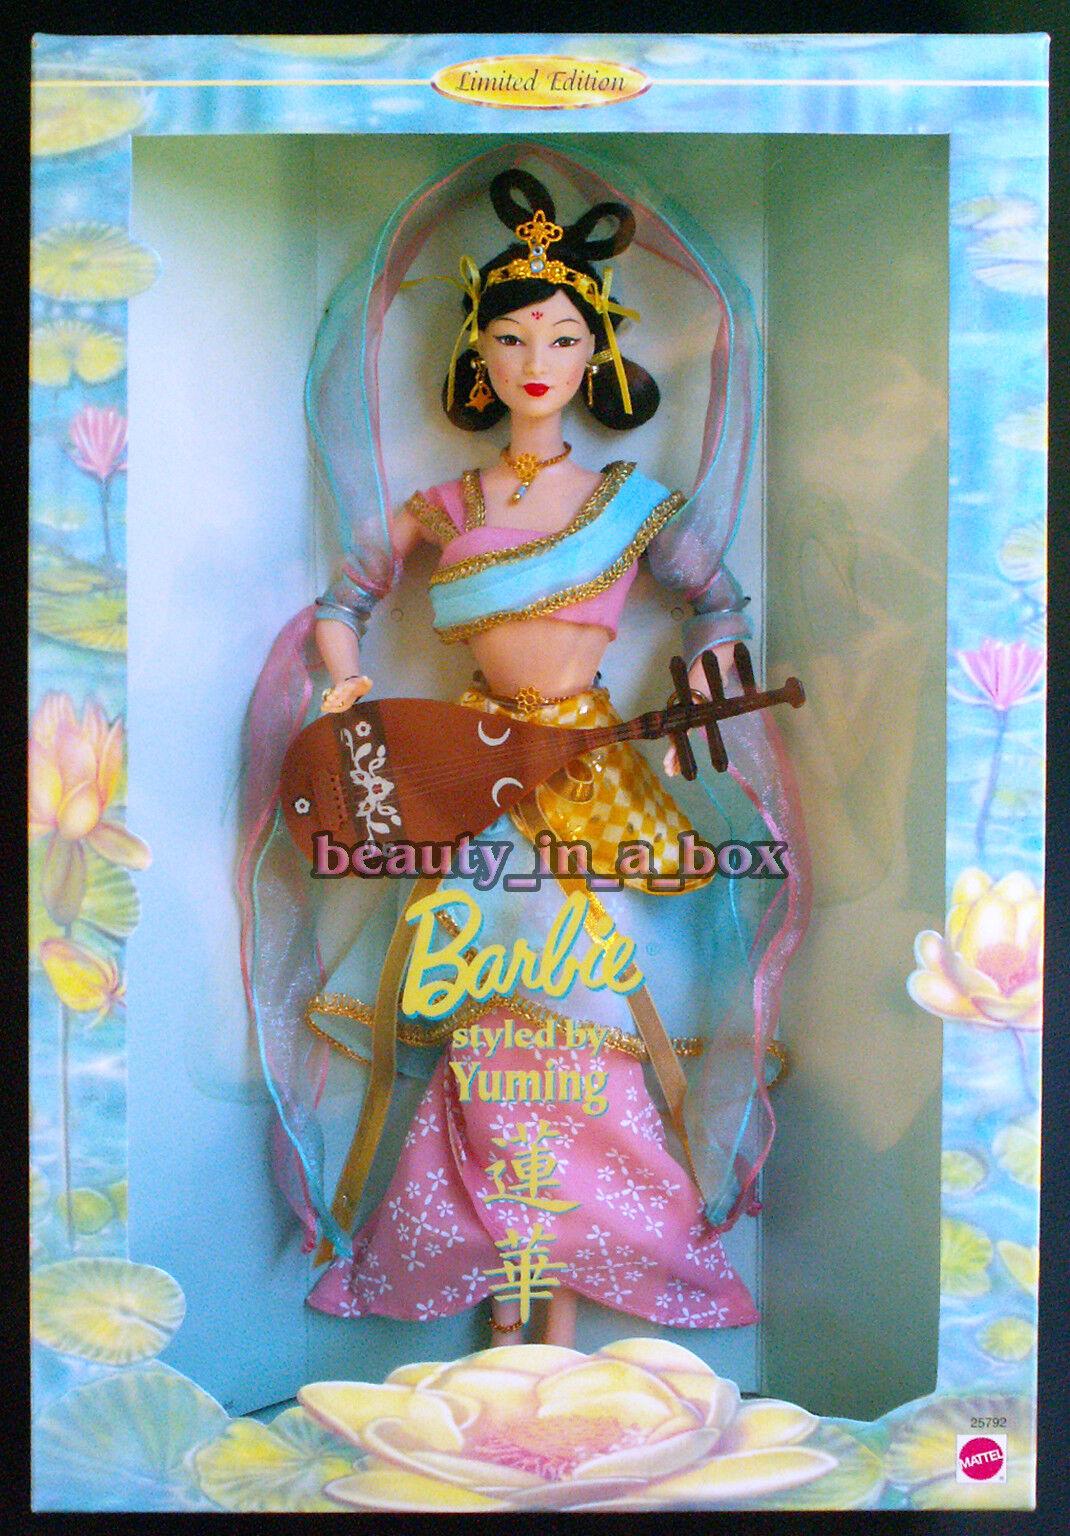 Muñeca Barbie Yuming diez-nyo musical Diosa del lago japonés budismo estilo